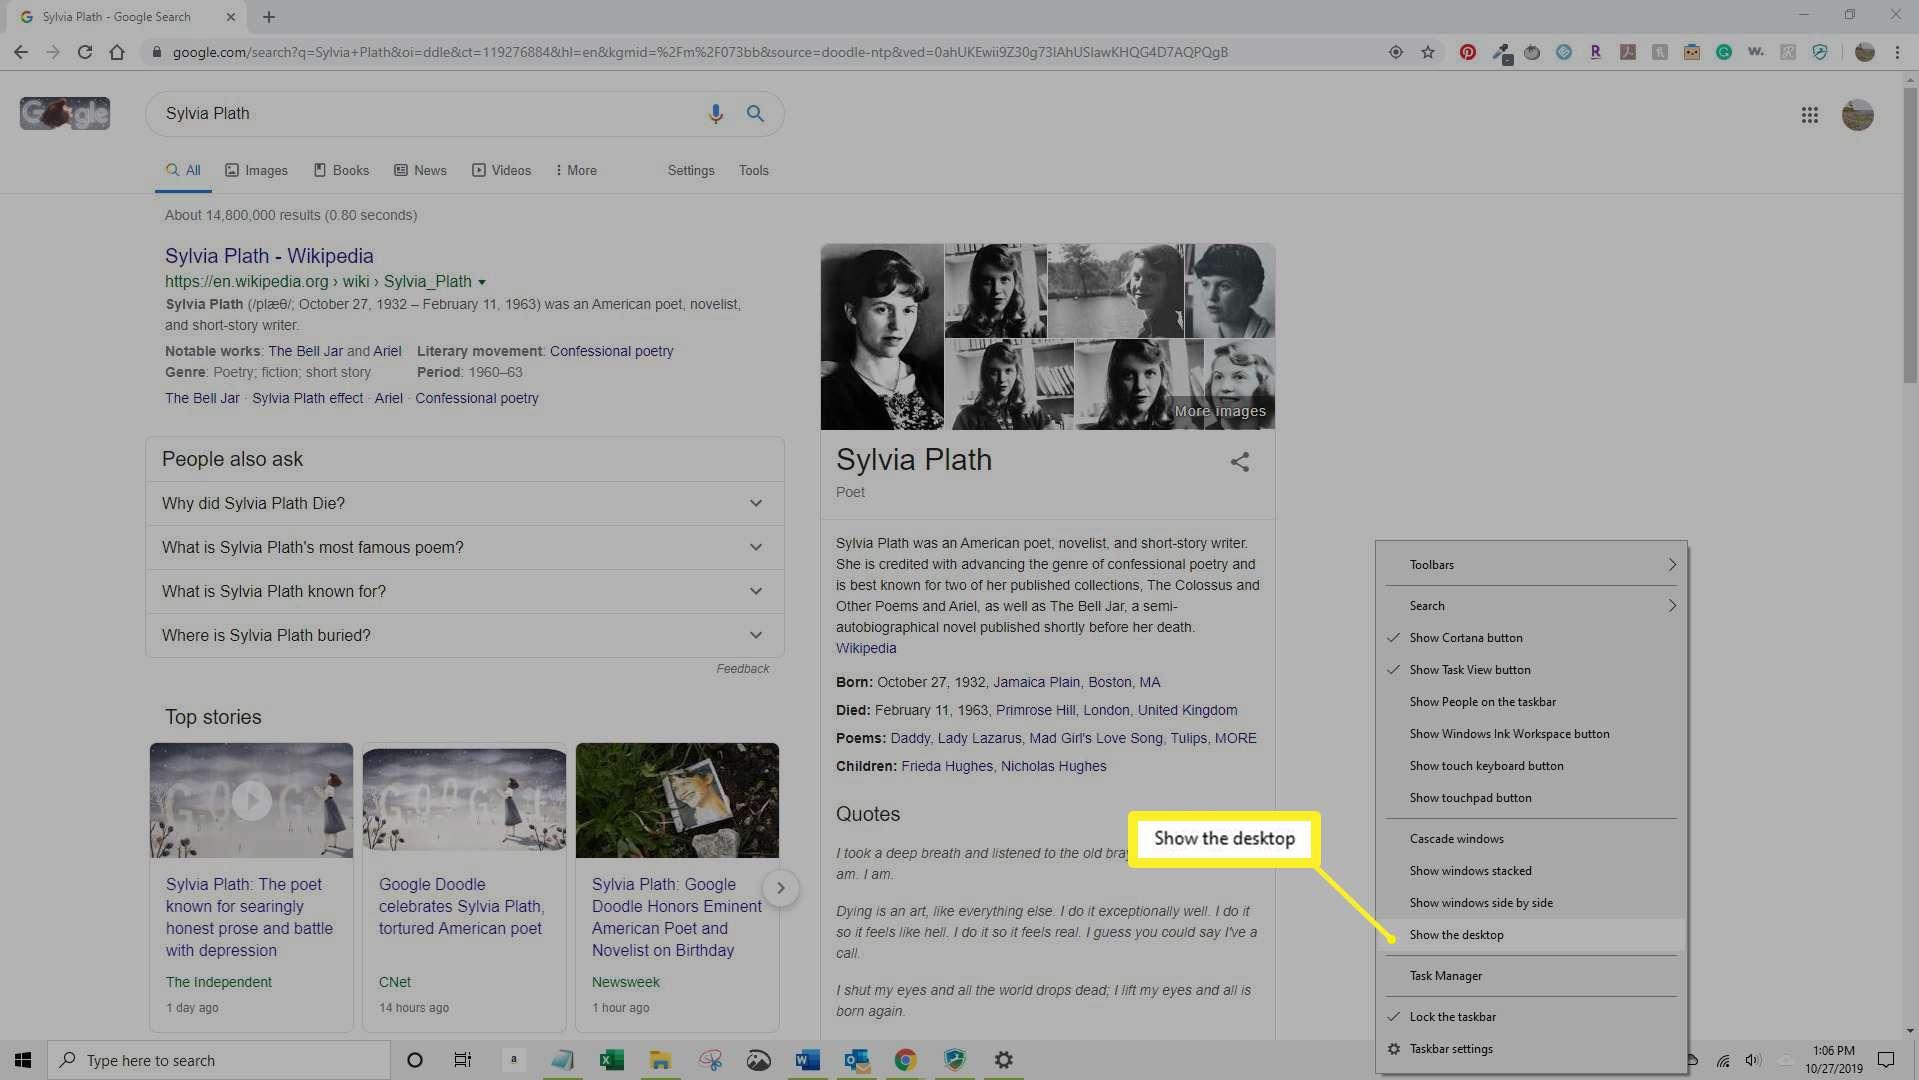 Show the desktop selection in menu